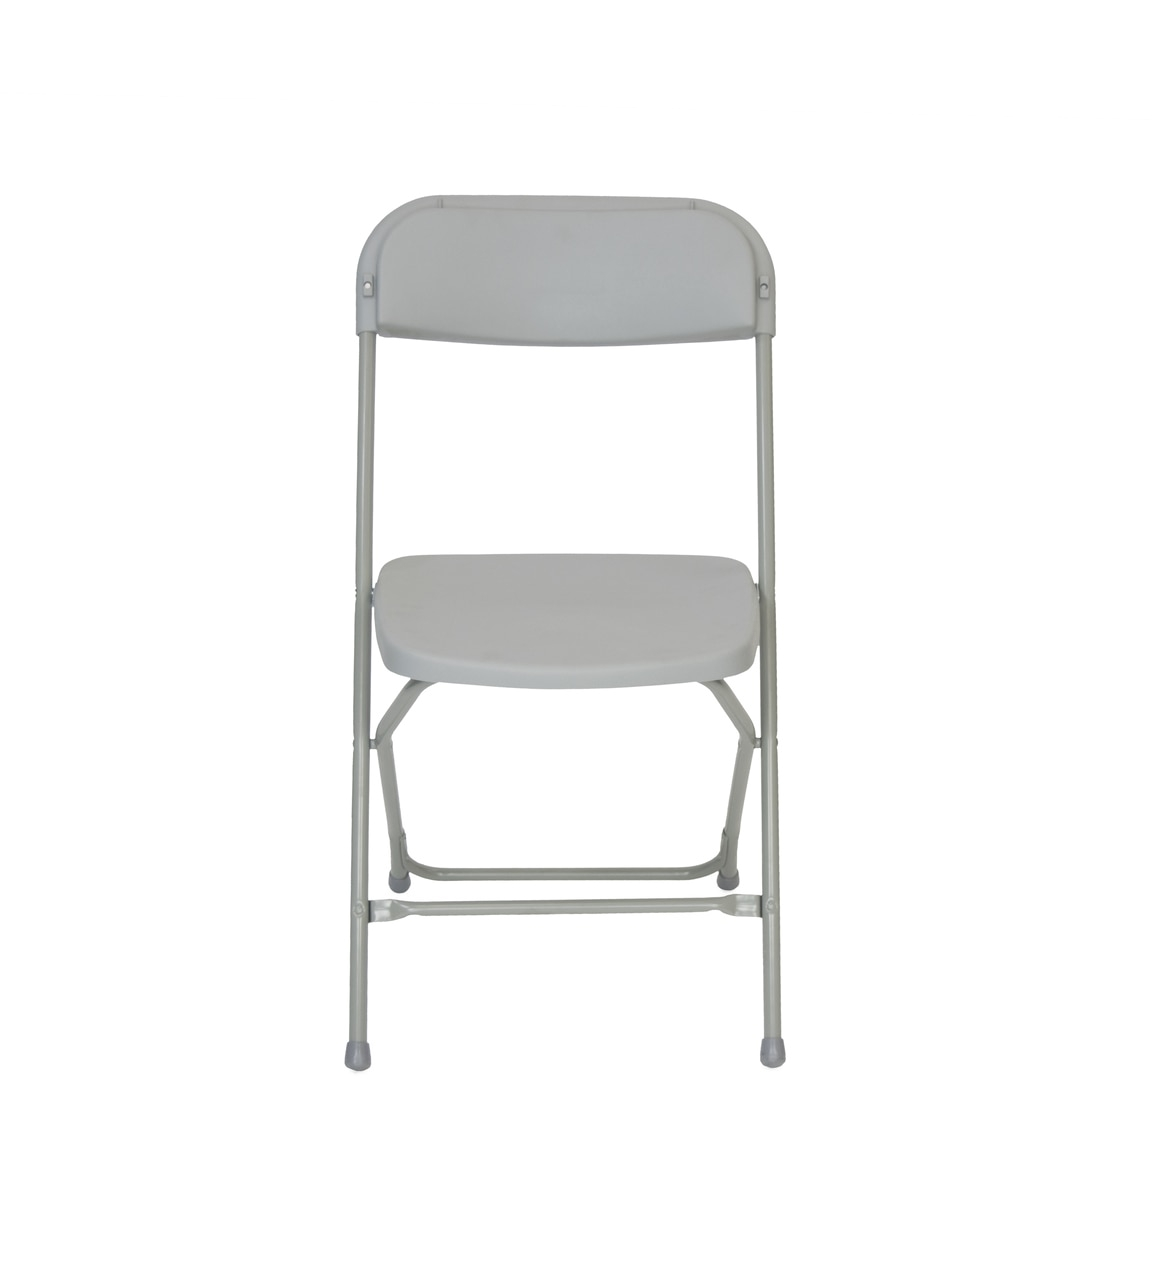 gray plastic folding chair premium rental style